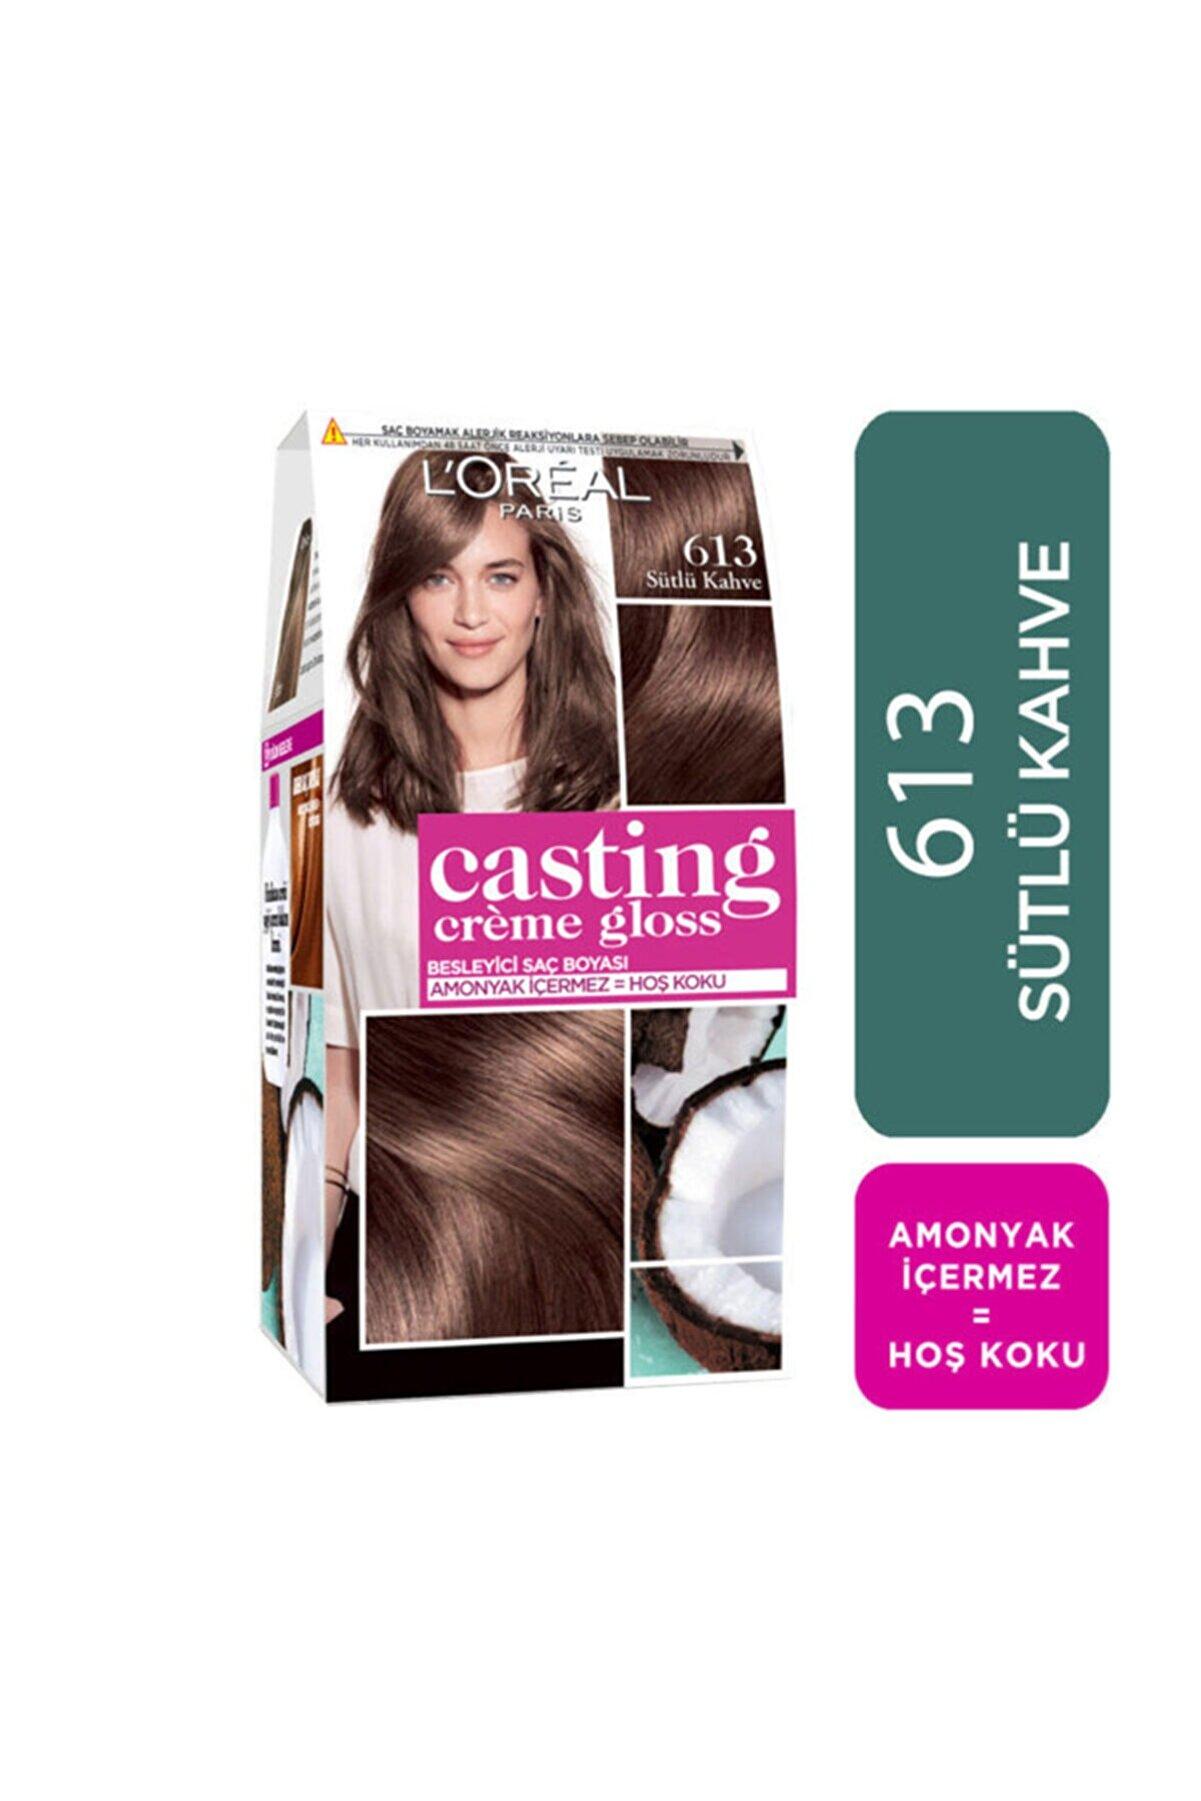 L'Oreal Paris Saç Boyası - Casting Creme Gloss 613 Sütlü Kahve 3600523302888